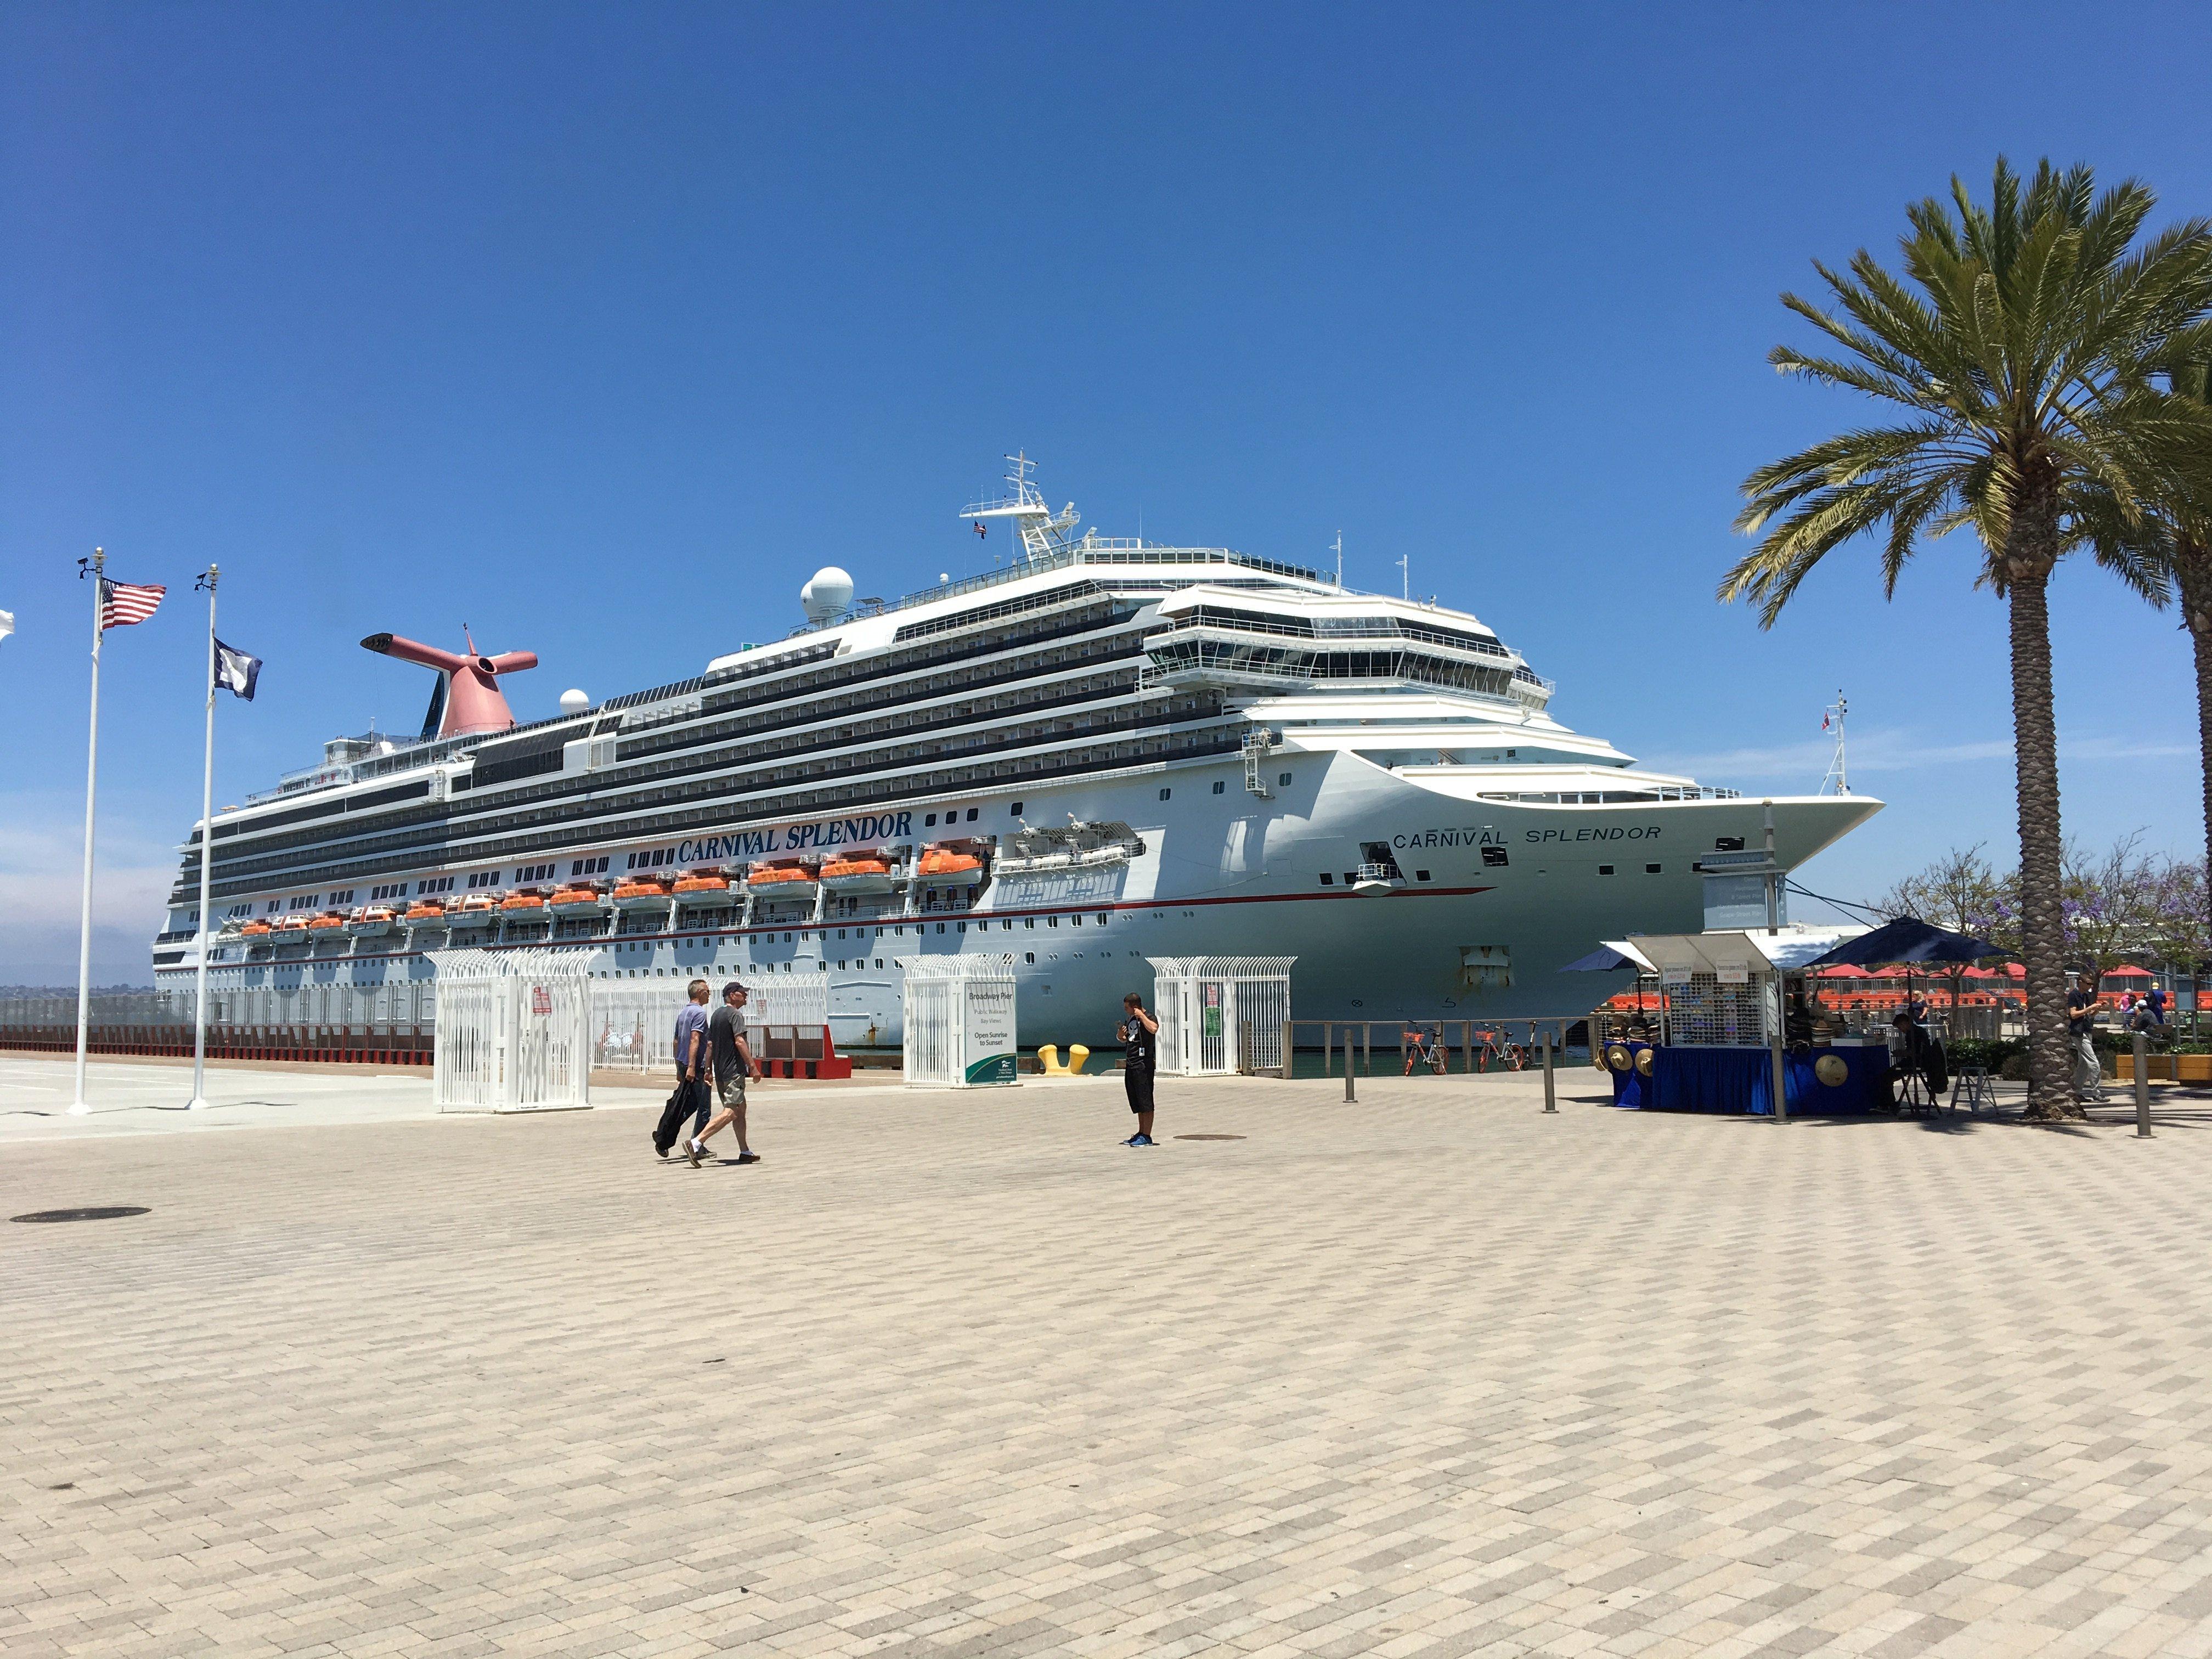 Carnival Splendor diverted to San Diego as Hurricane Bud